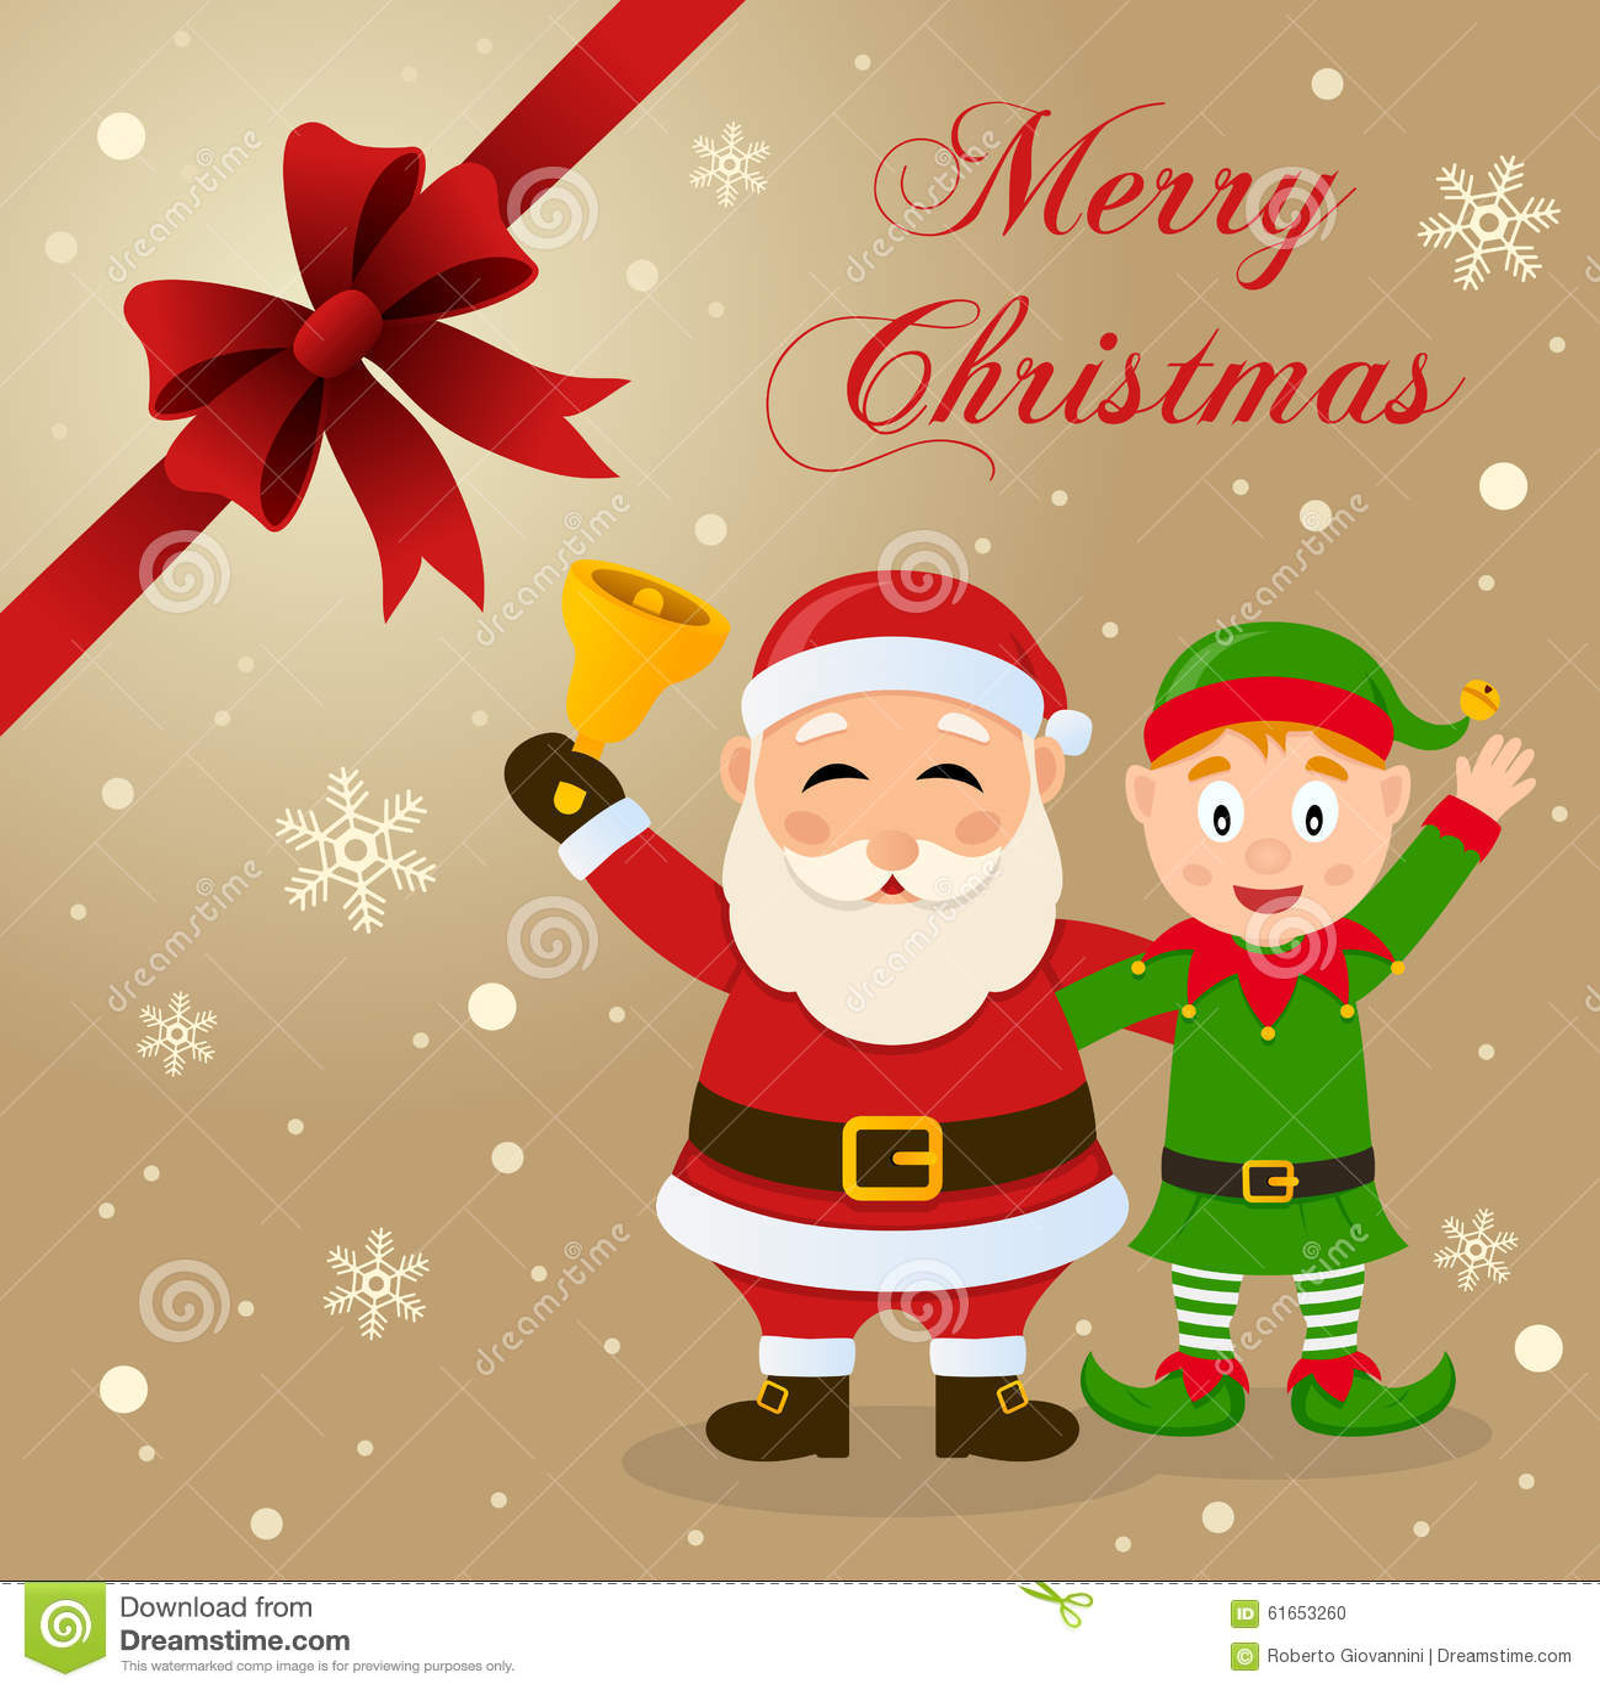 santa claus elf christmas card - Elf Christmas Card